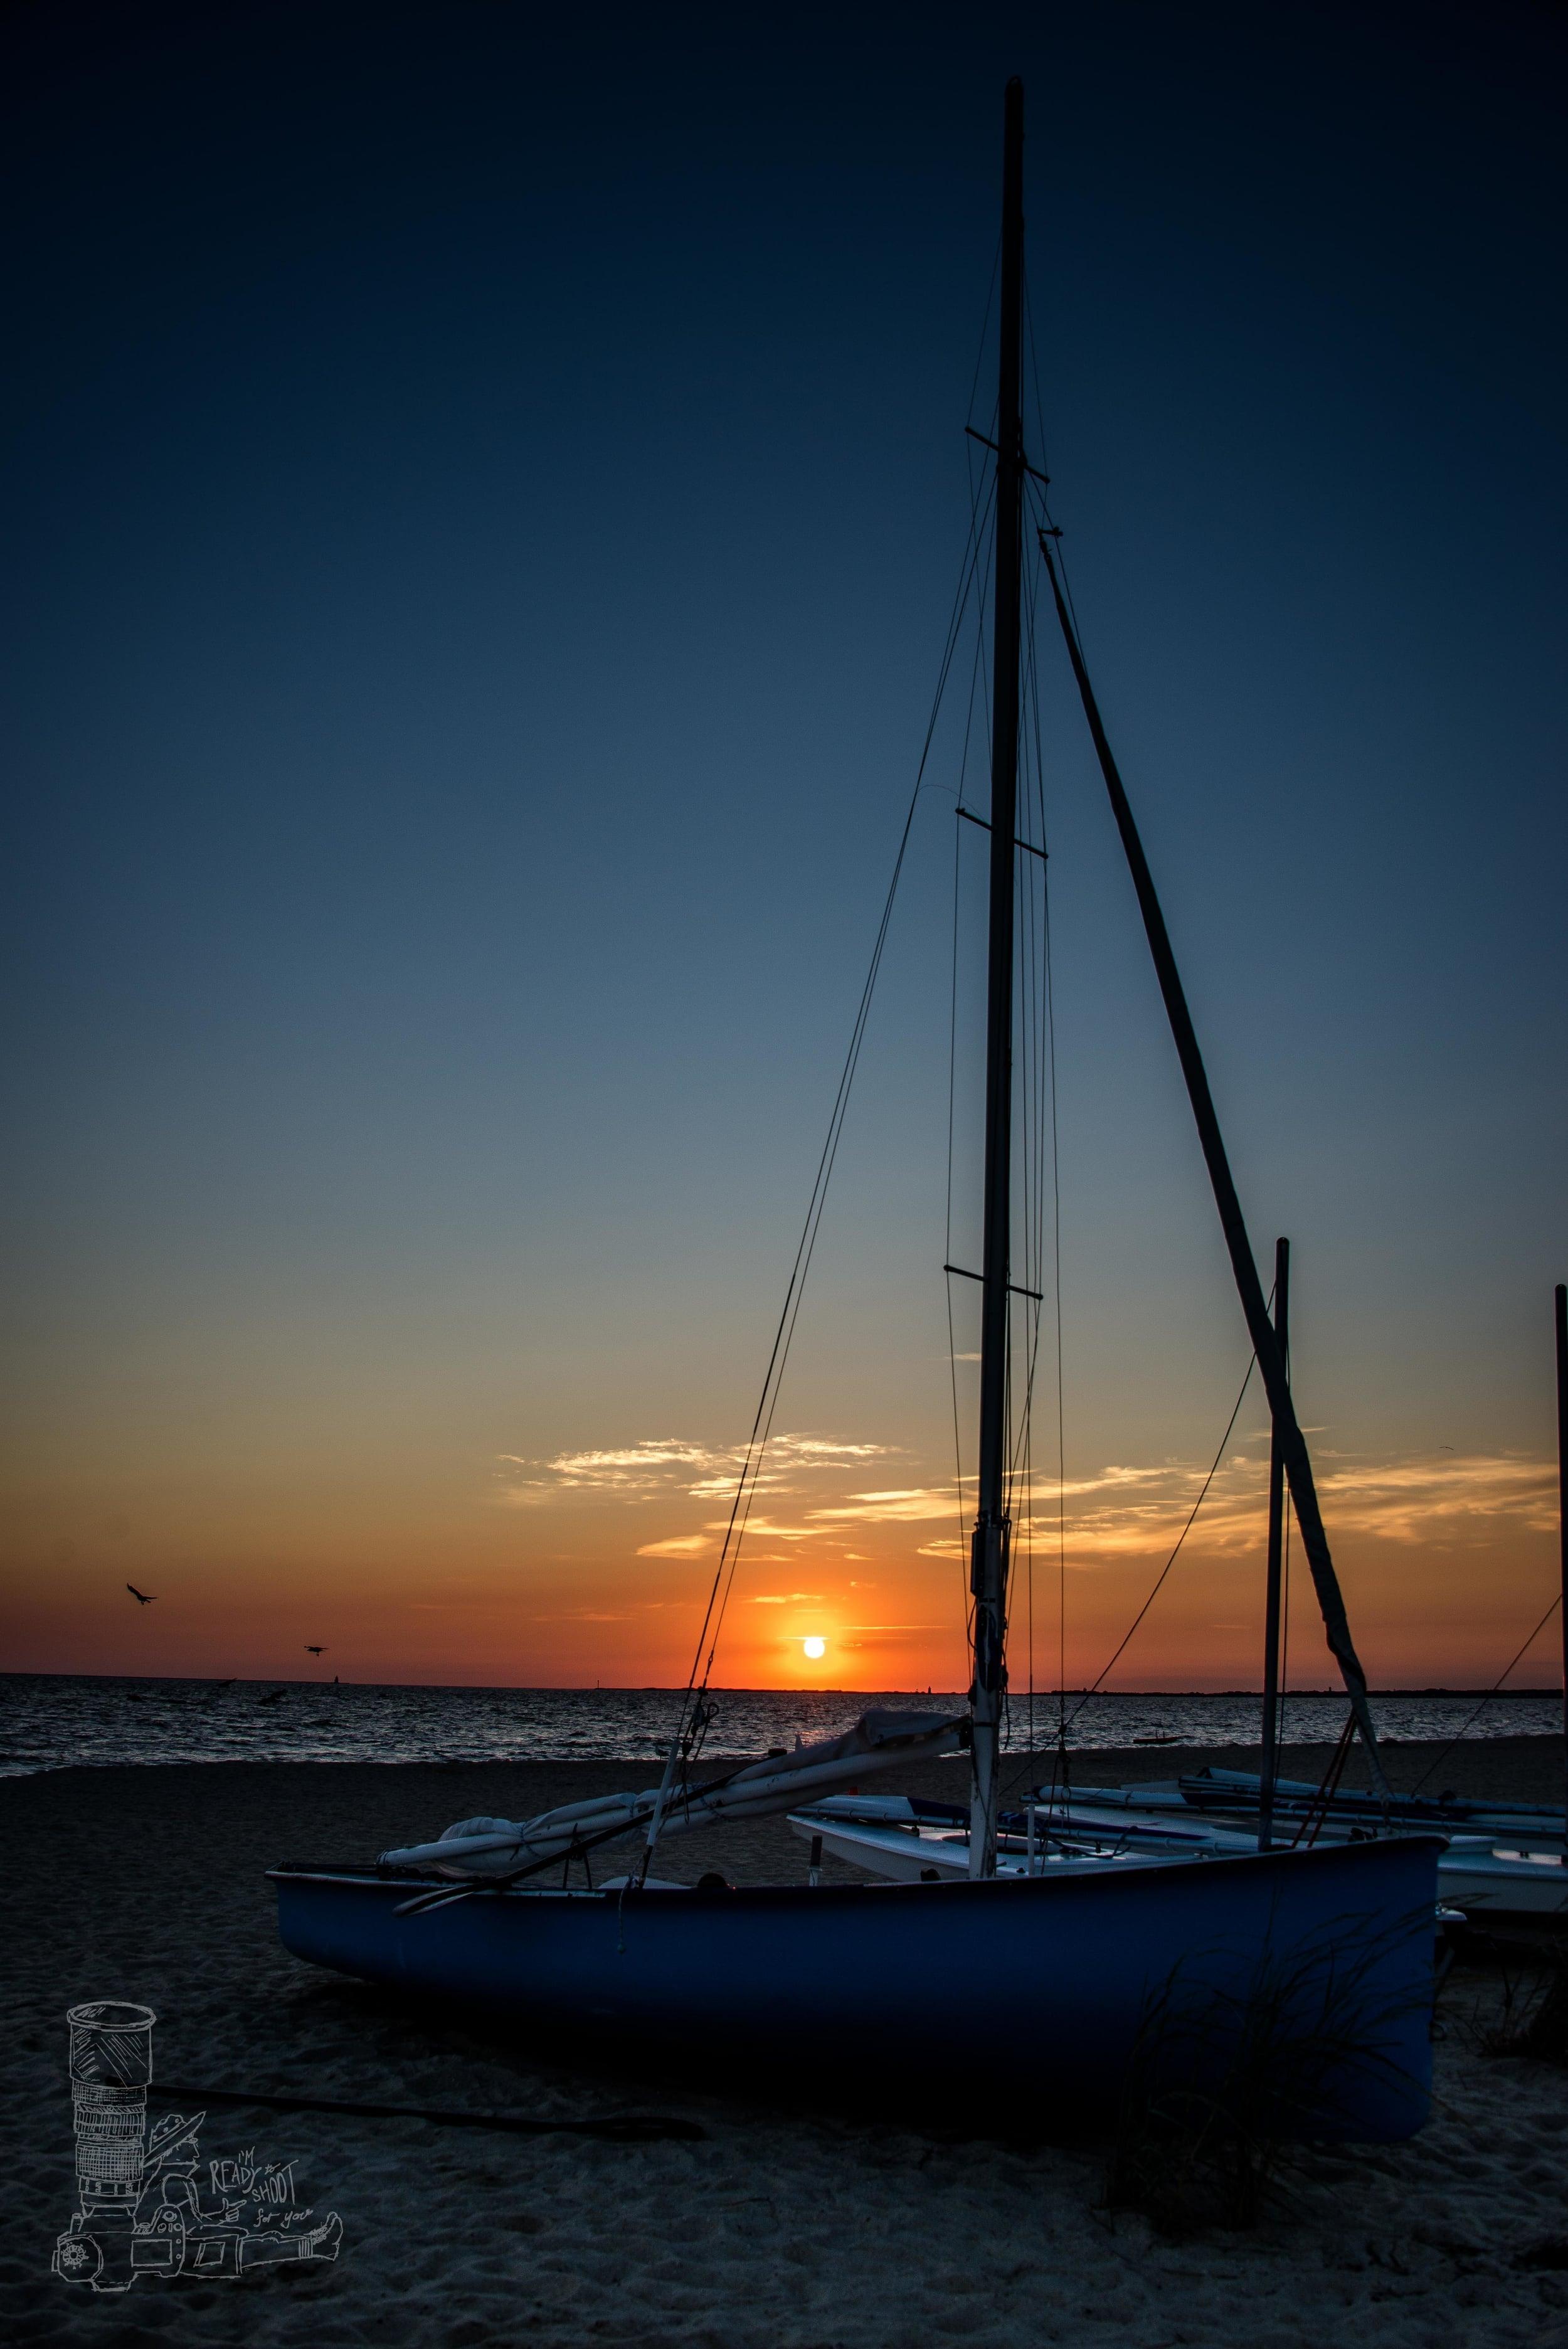 Sunrise & Sailboats